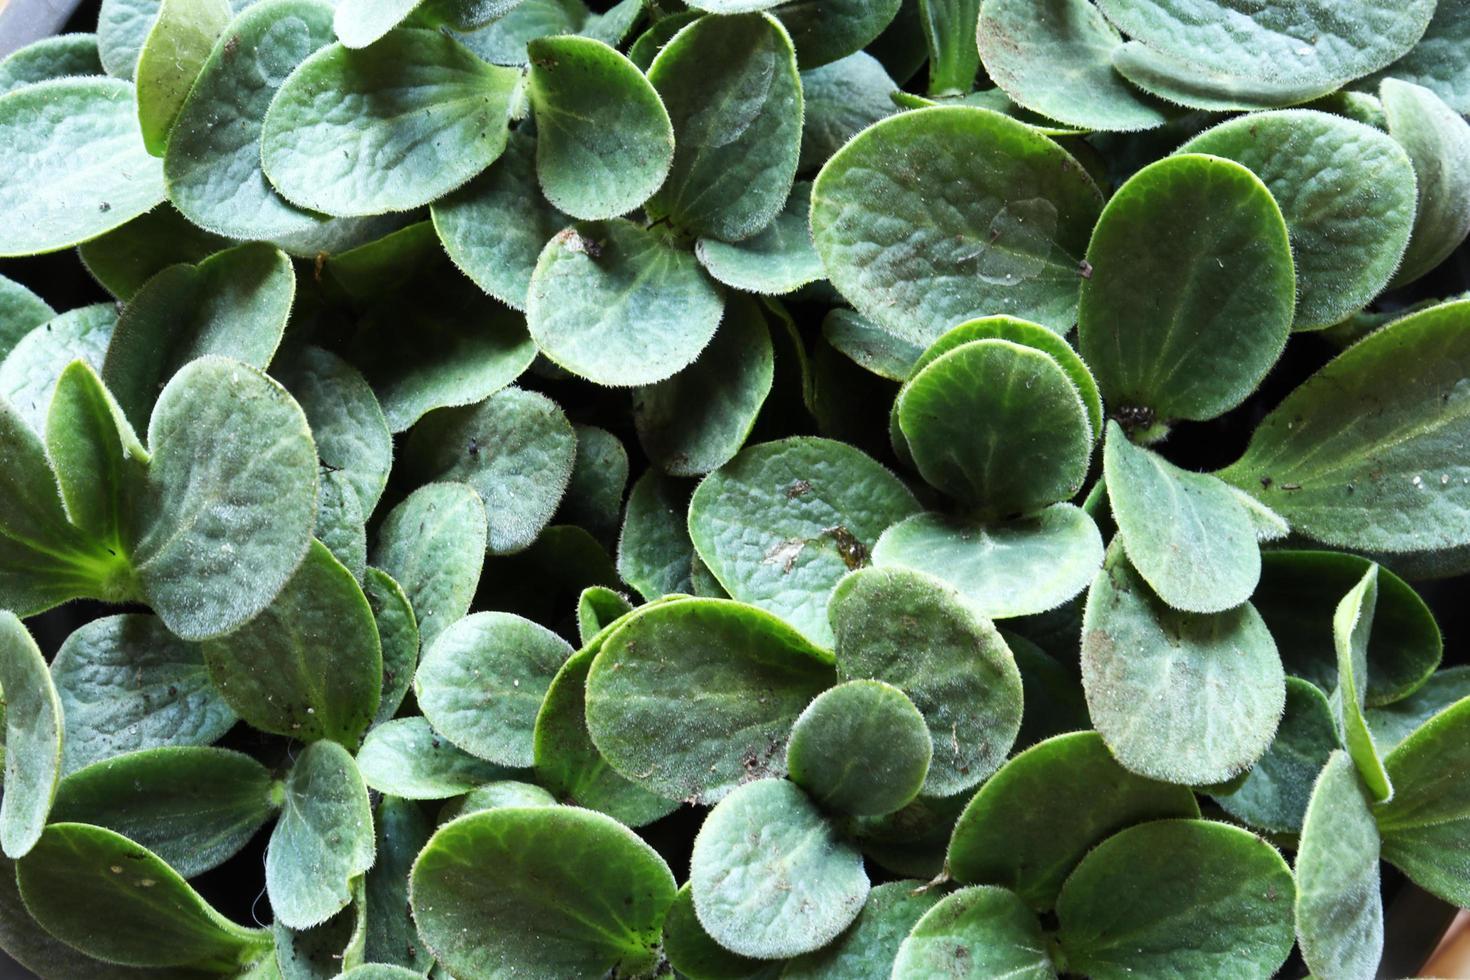 butternut squash babyplanten foto